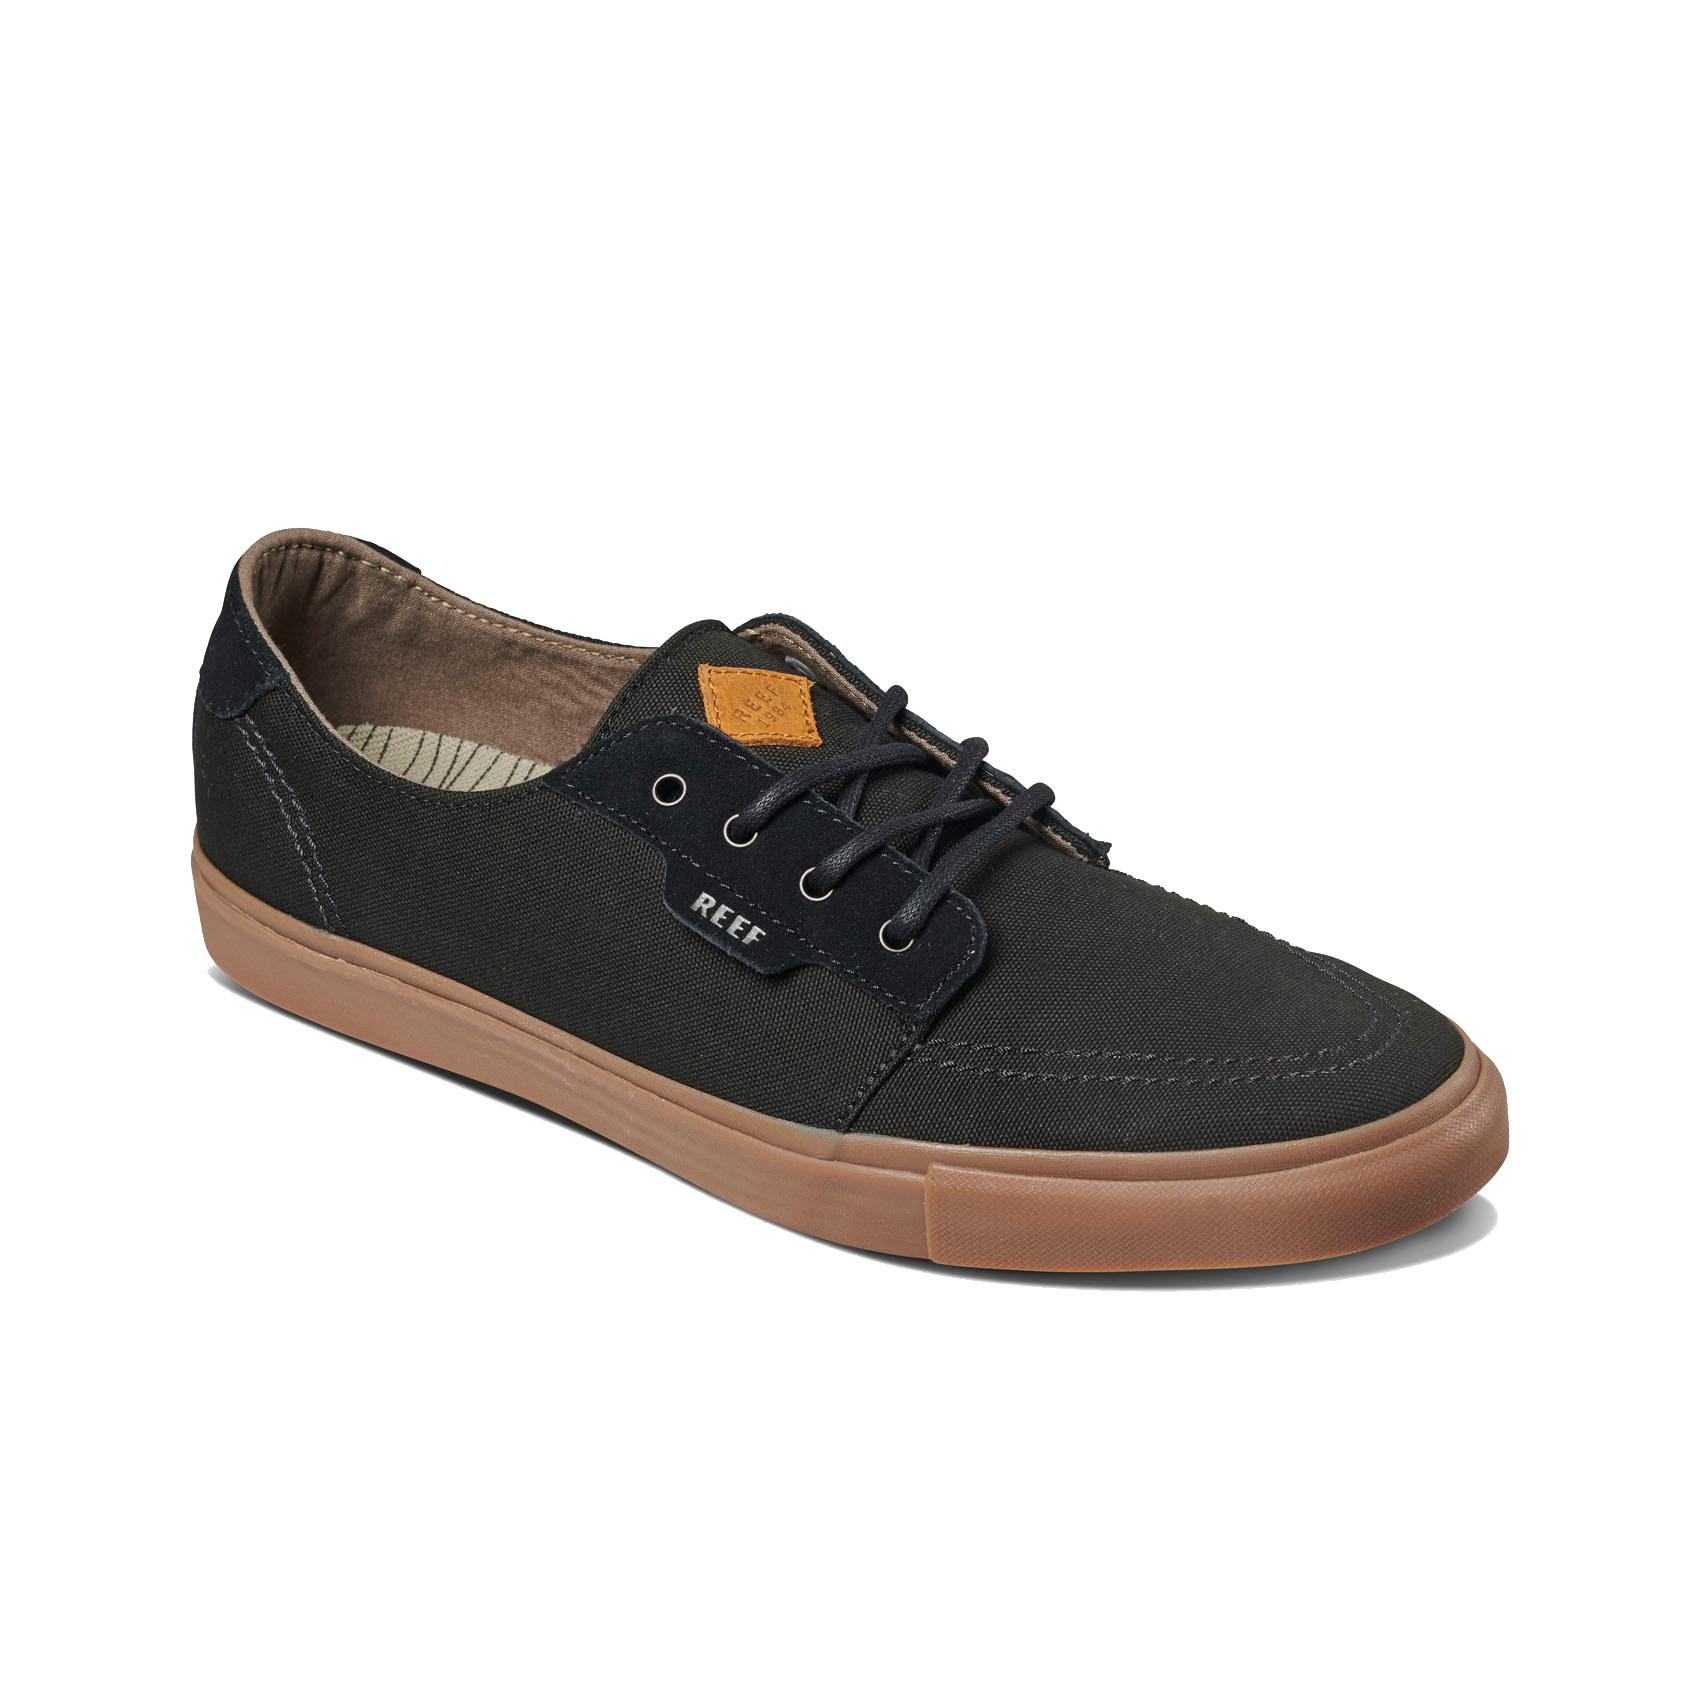 c2f56706b02e9 Sentinel Reef Surf Style Shoes - Banyan 2 - Black Gum, Premium Canvas  Upper. Sentinel Thumbnail 2